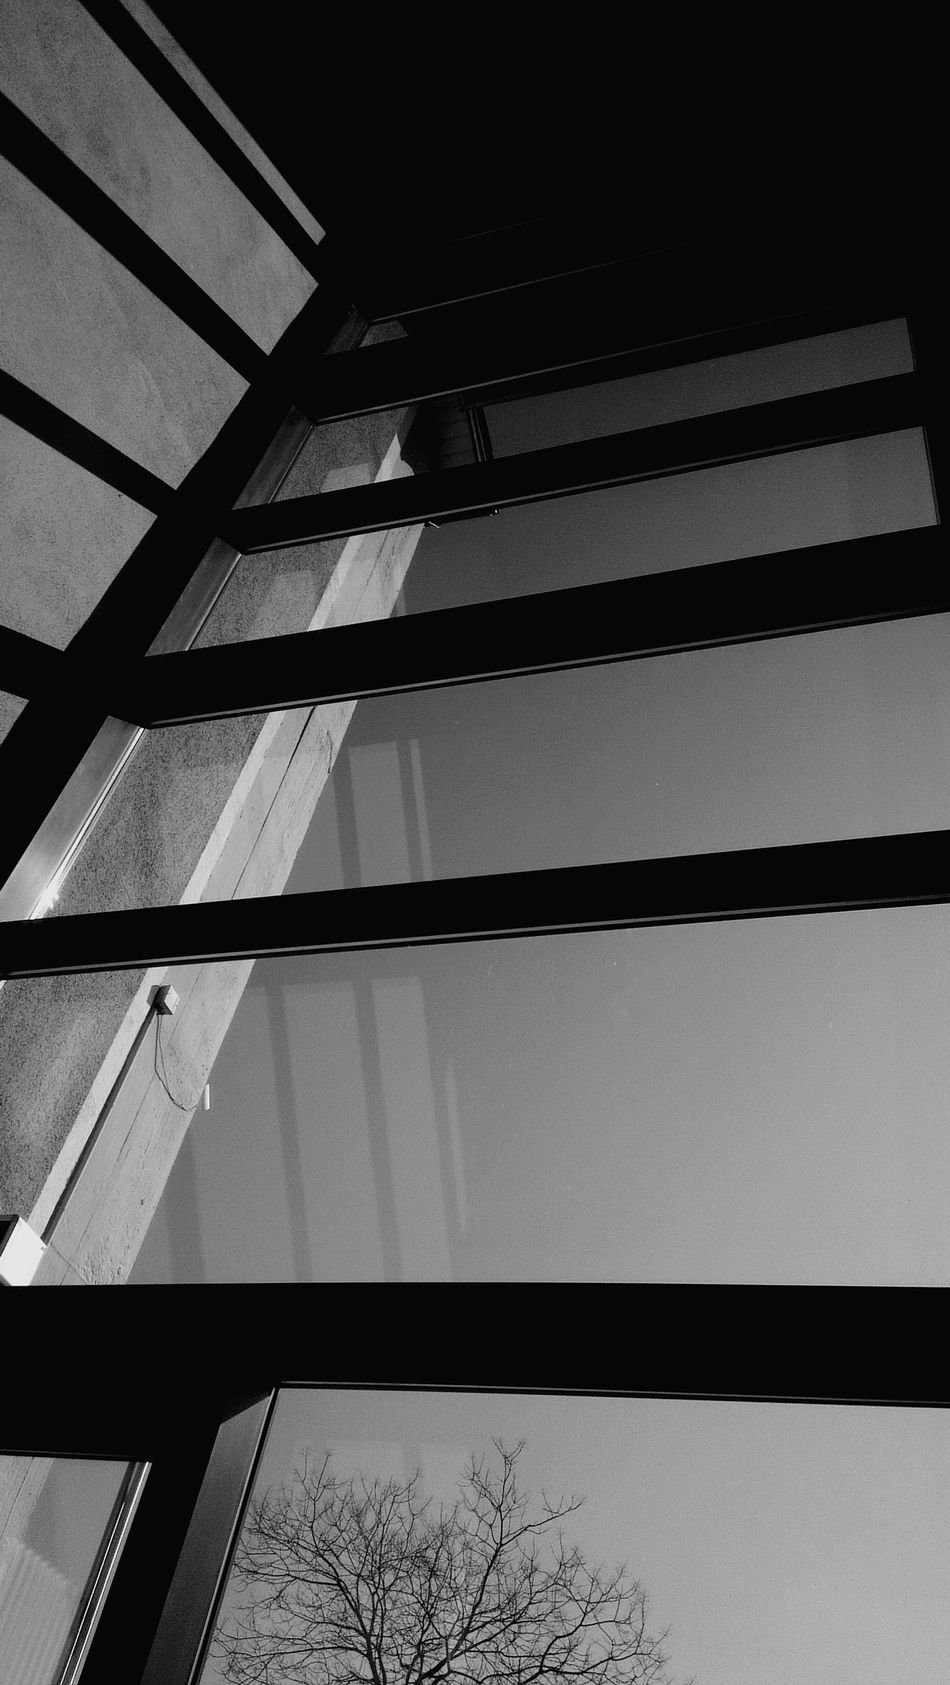 Window Reflections EyeEm Best Shots Simplicity Smart Simplicity EyeEm Best Shots - Black + White Simple Photography Simple.